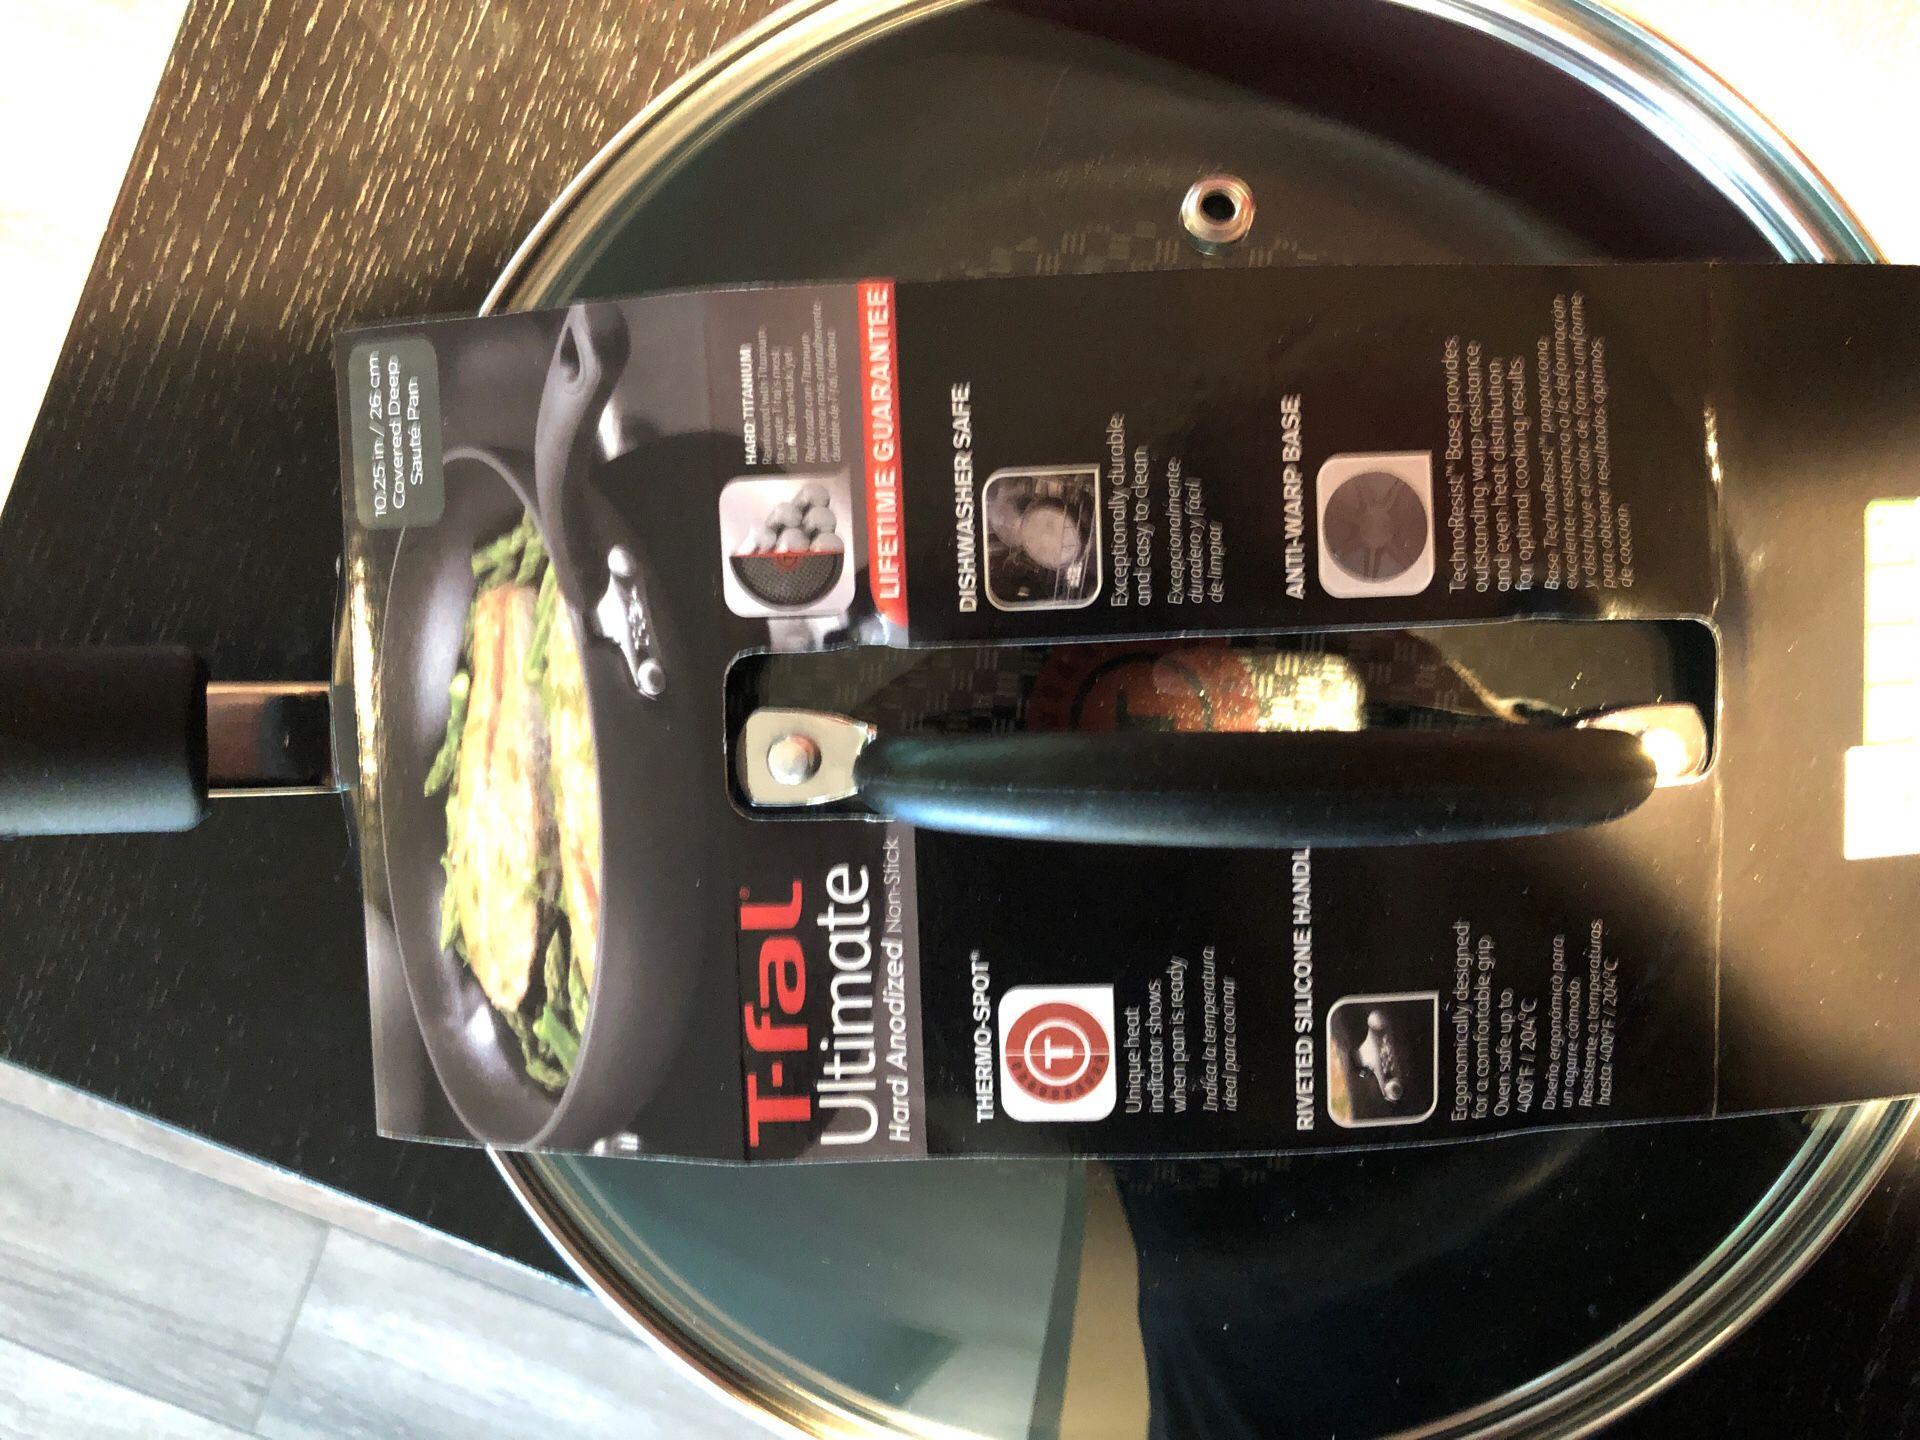 T-fal 10inch Deep Sauté/Frying Pan - BRAND NEW